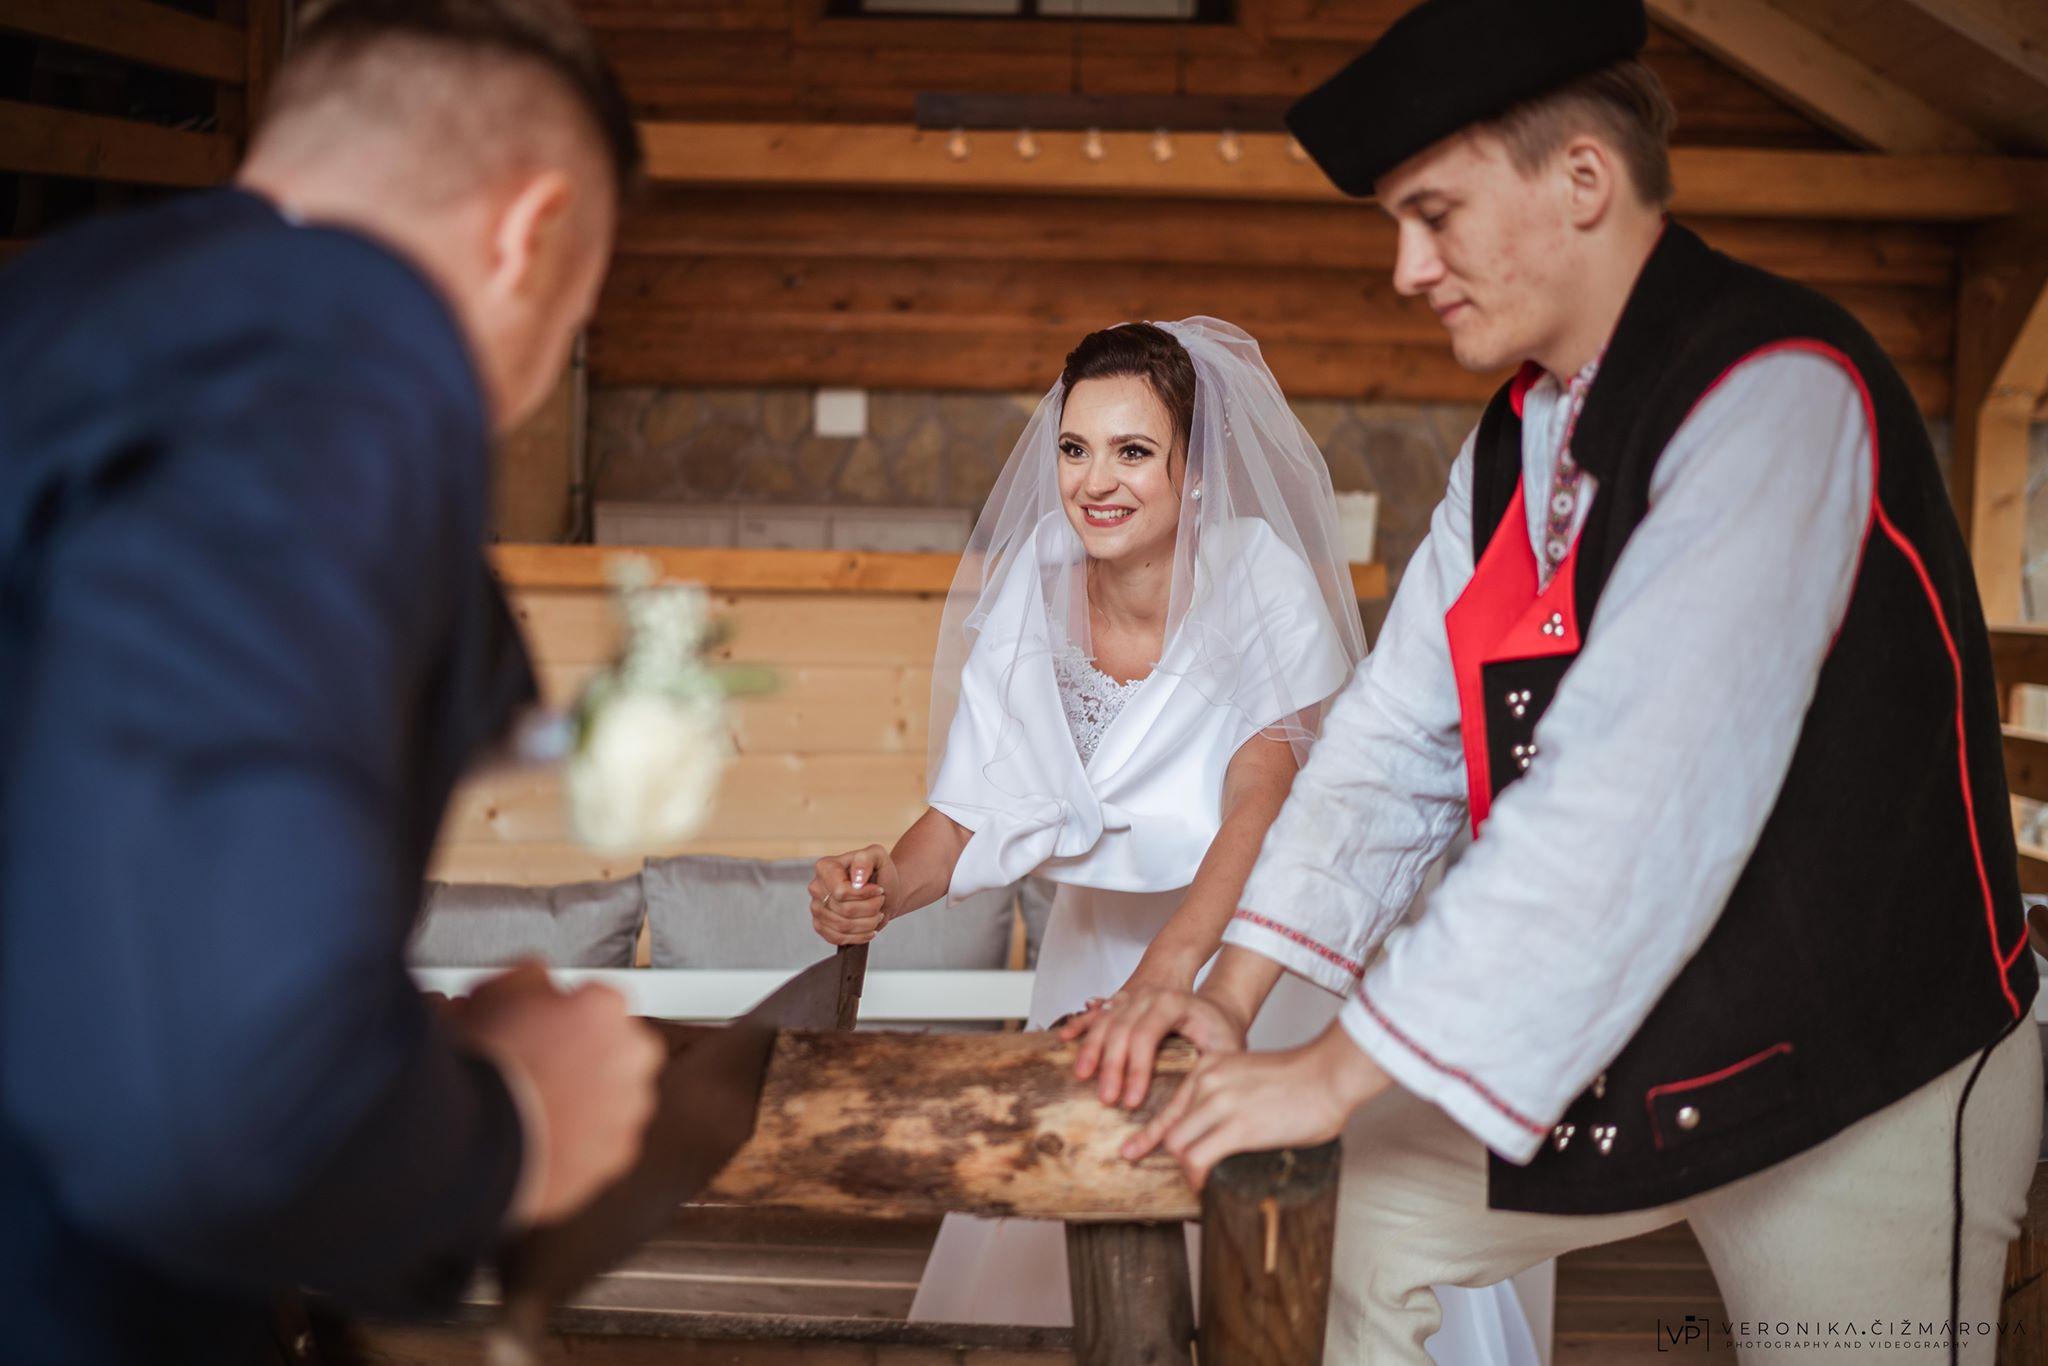 marlene-oscadnica-pilenie-dreva-tradicia-svadbajpg